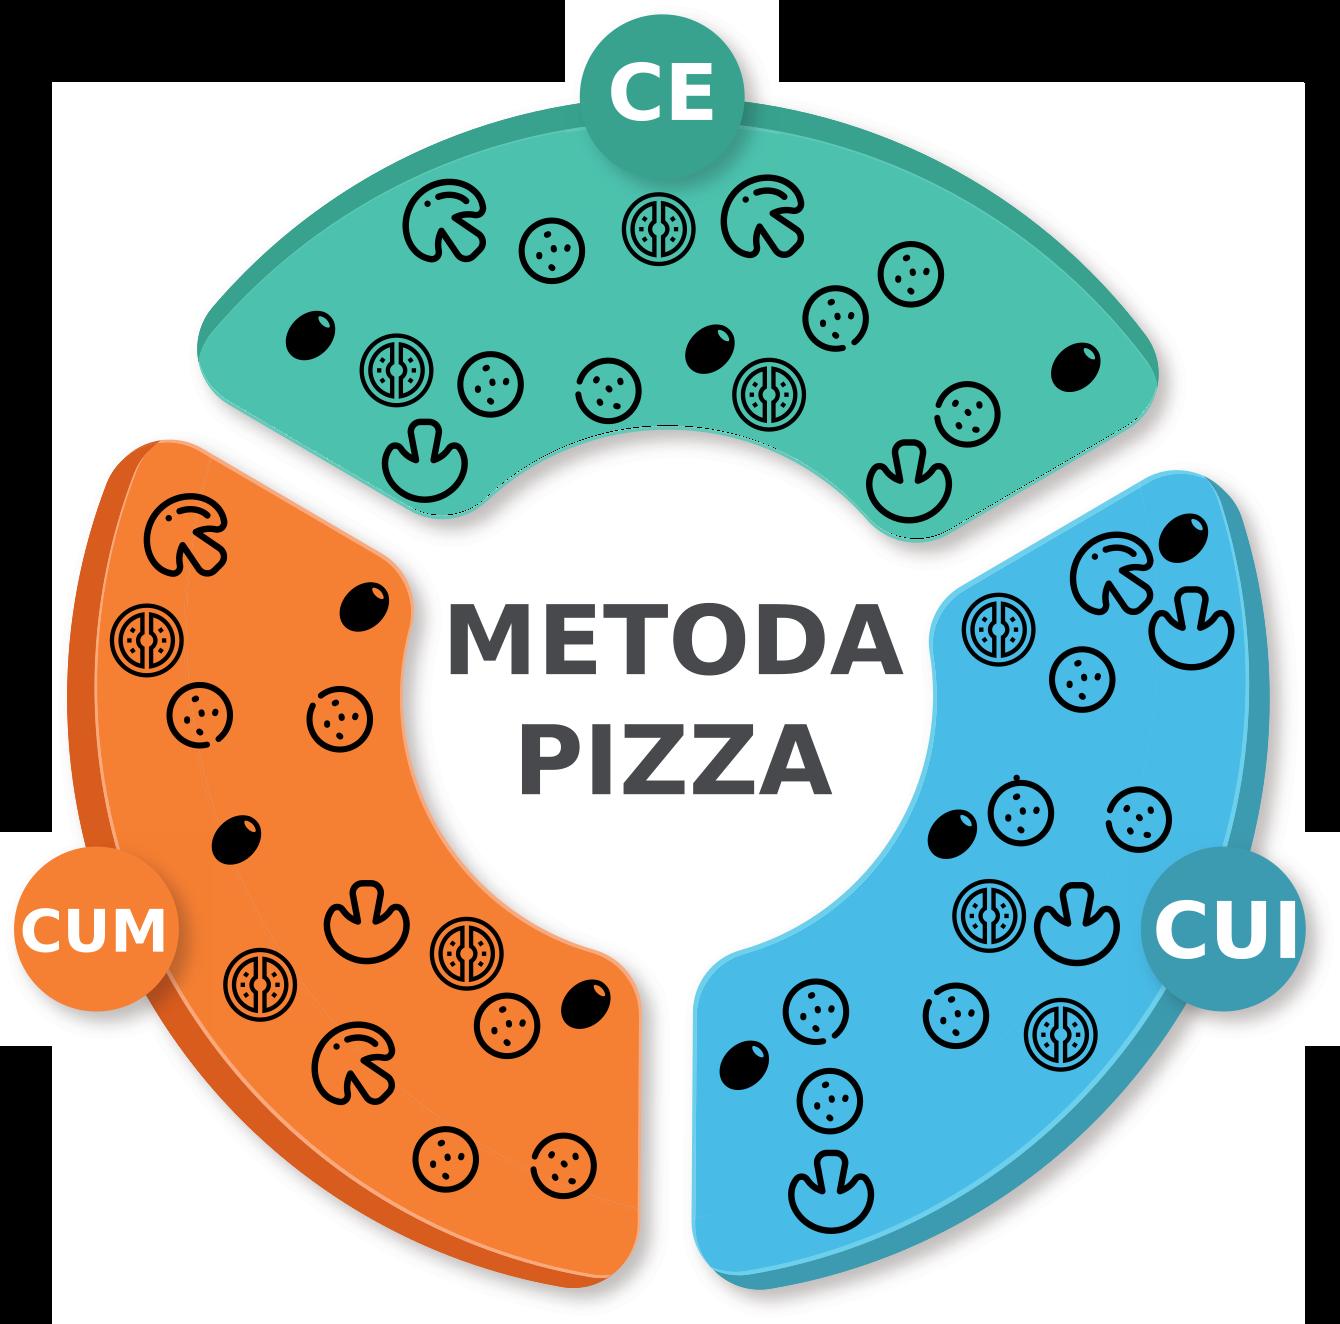 Curs Rapid de Antreprenoriat - Metoda Pizza 1